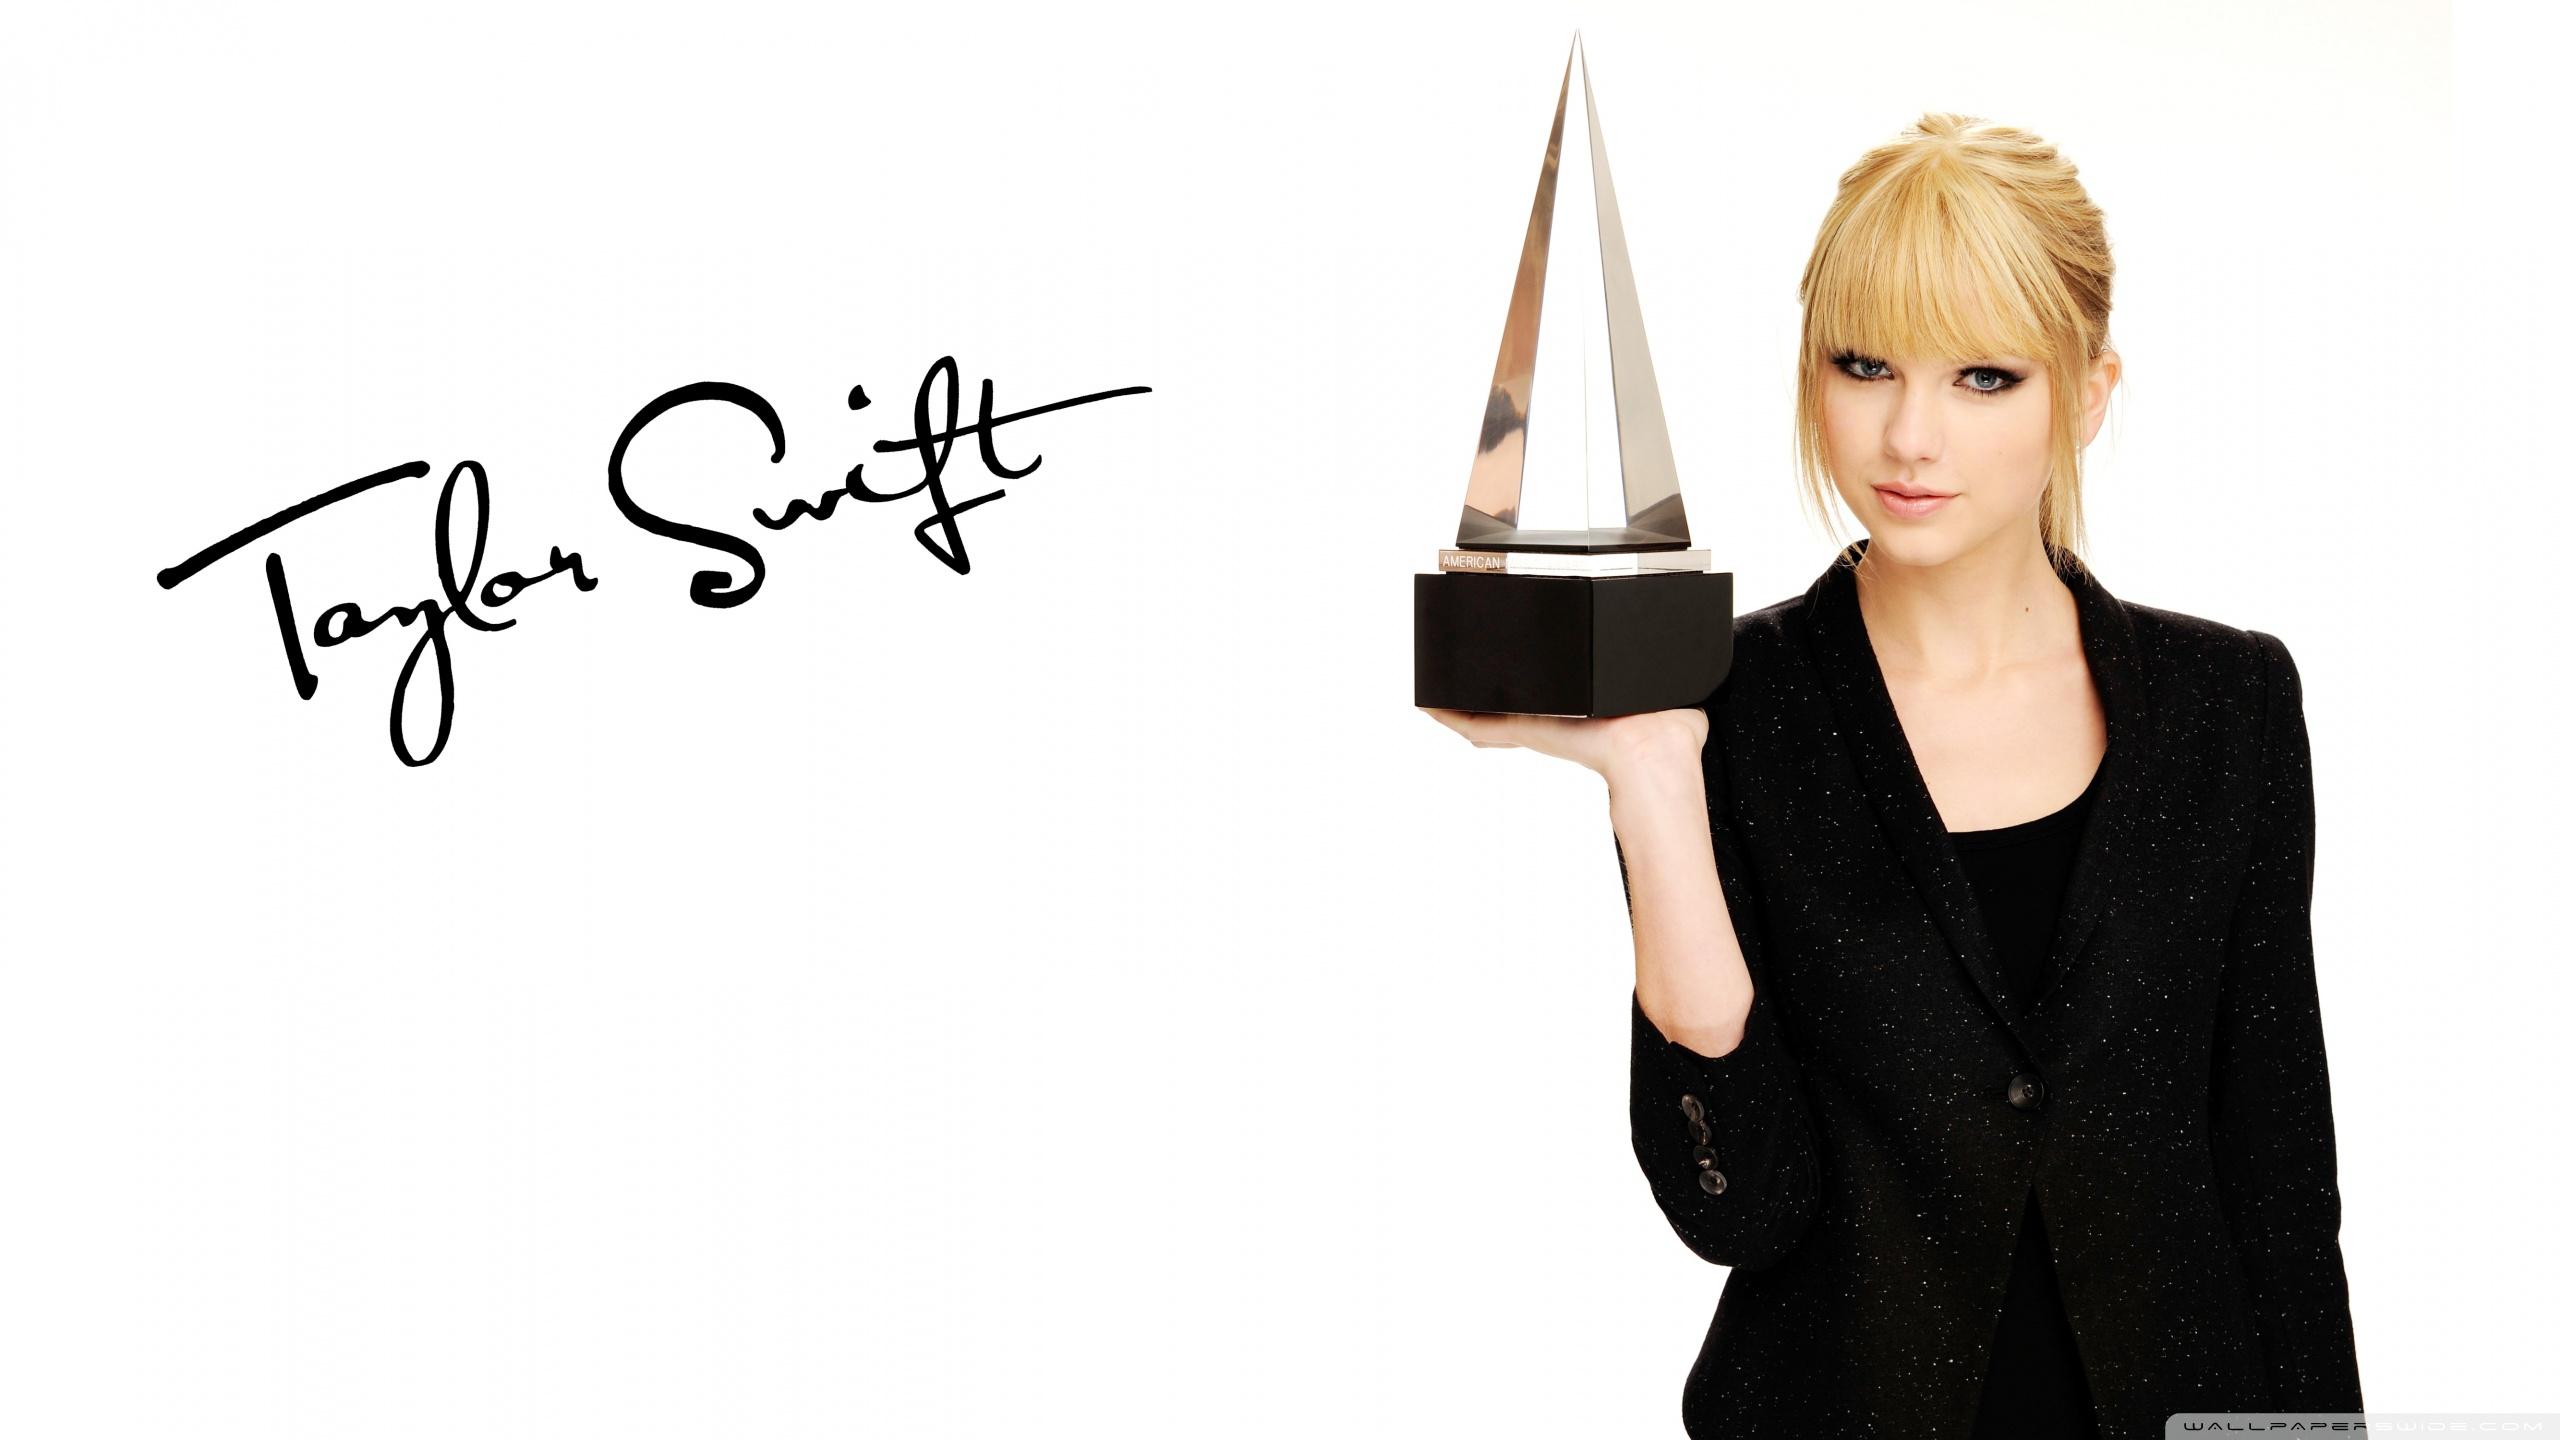 Taylor Swift American Music Awards 4K HD Desktop Wallpaper for 2560x1440